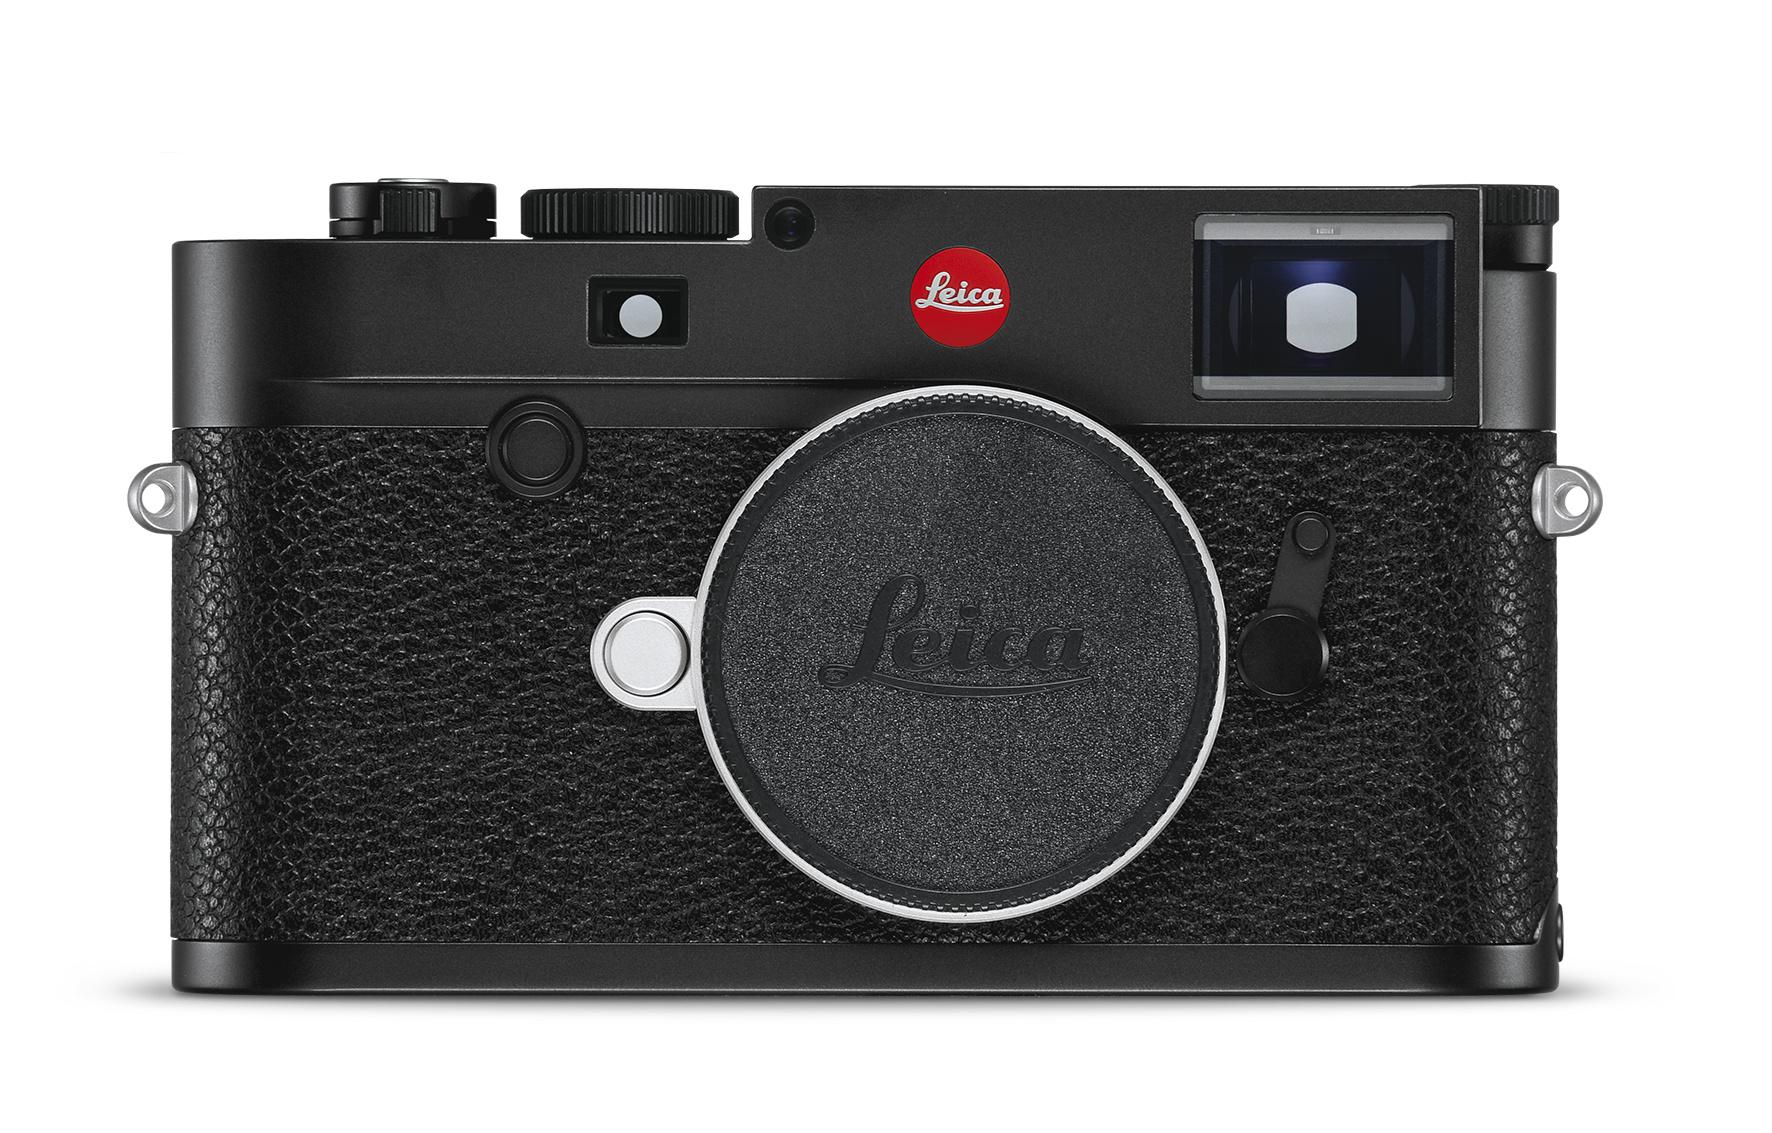 Leica M10-R, Black Chrome Finish